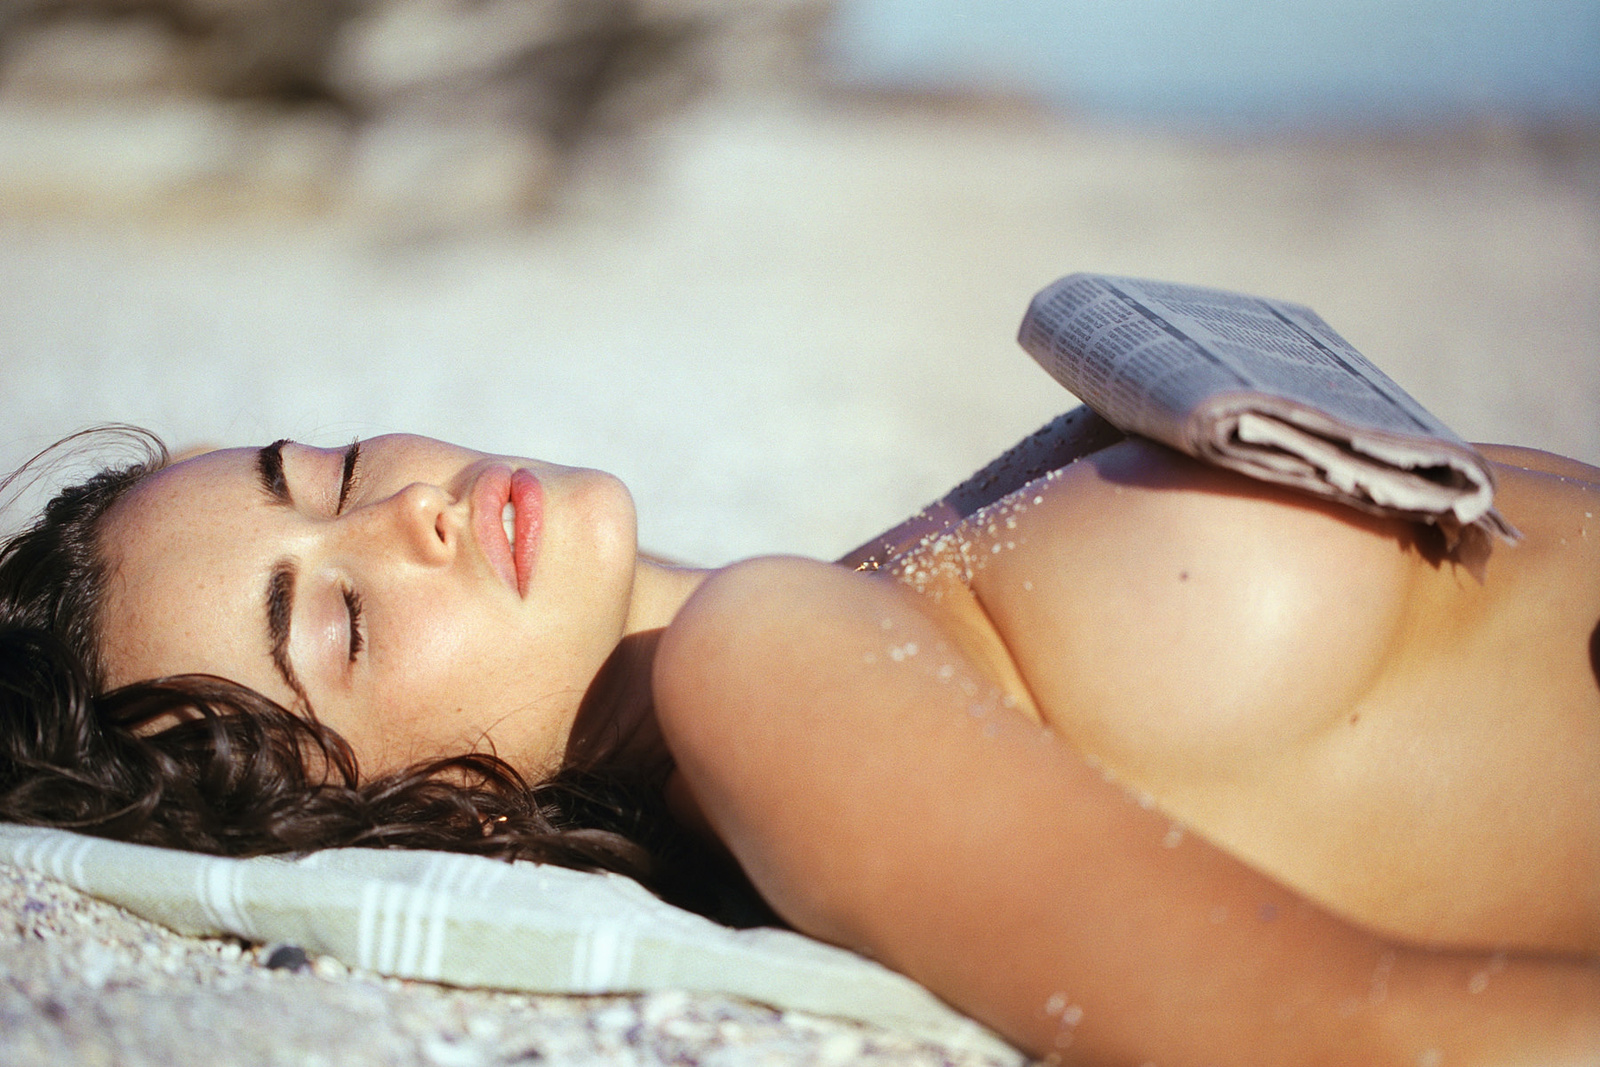 sarah-stephens-seaside-erotic-photo-by-cameron-mackie-15